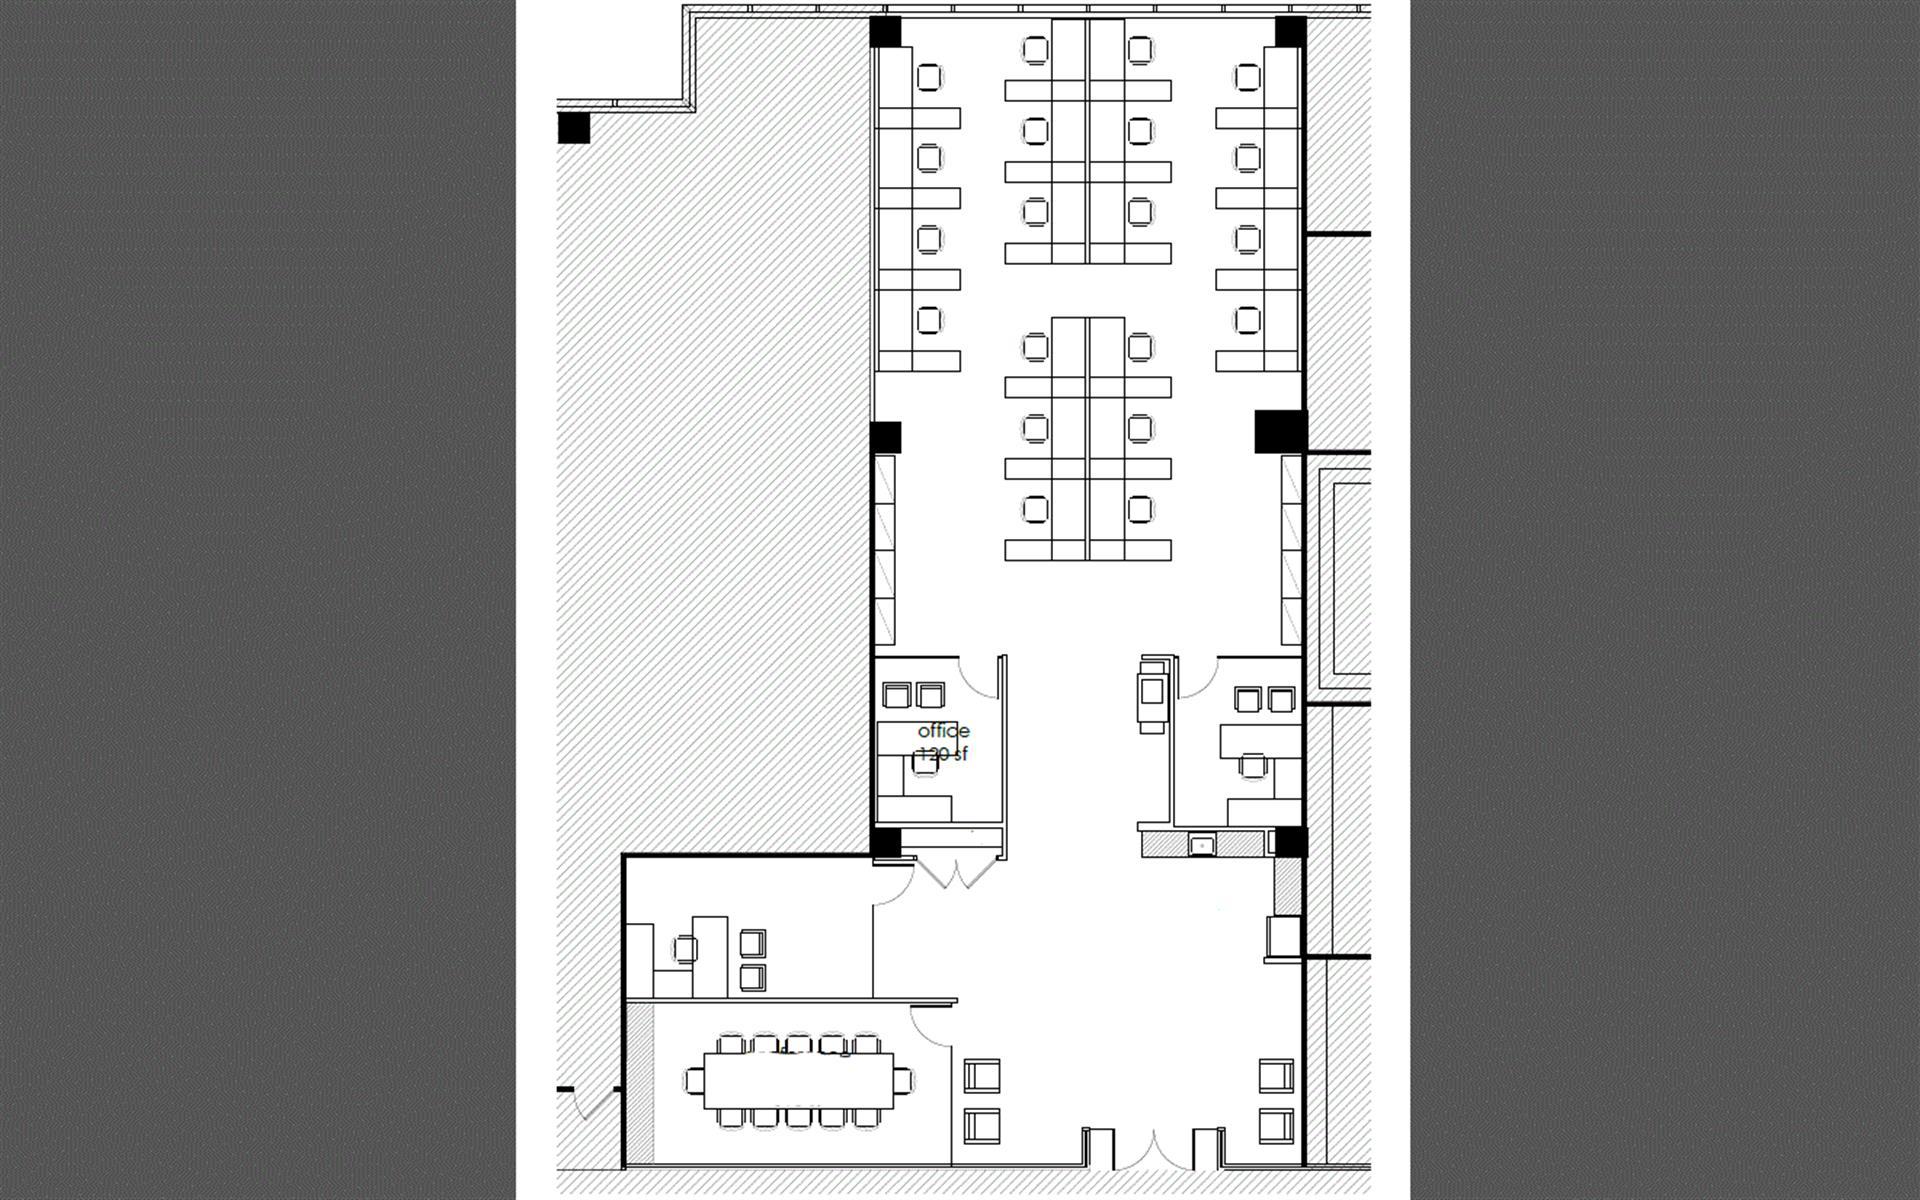 WashingtonREIT | Silverline Center - Team Office | Suite A160 (3808 Sq Ft)